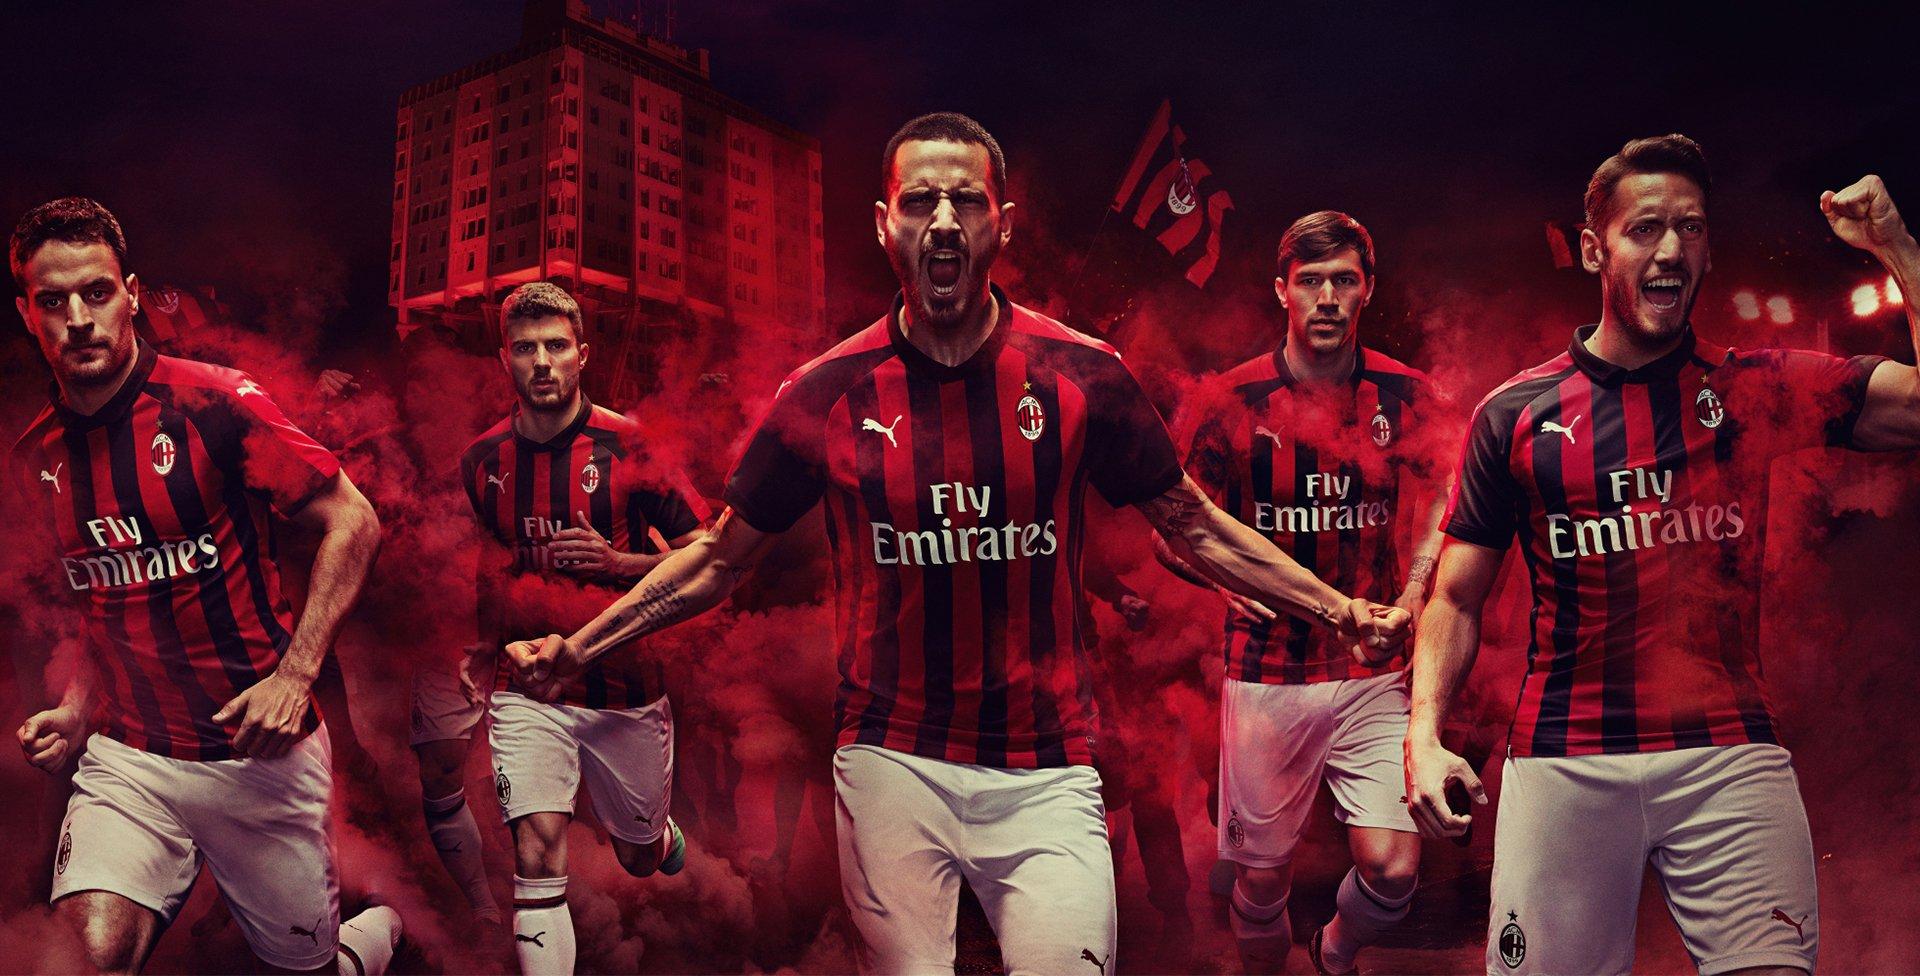 Ac Milan 2018 19 Home Shirt